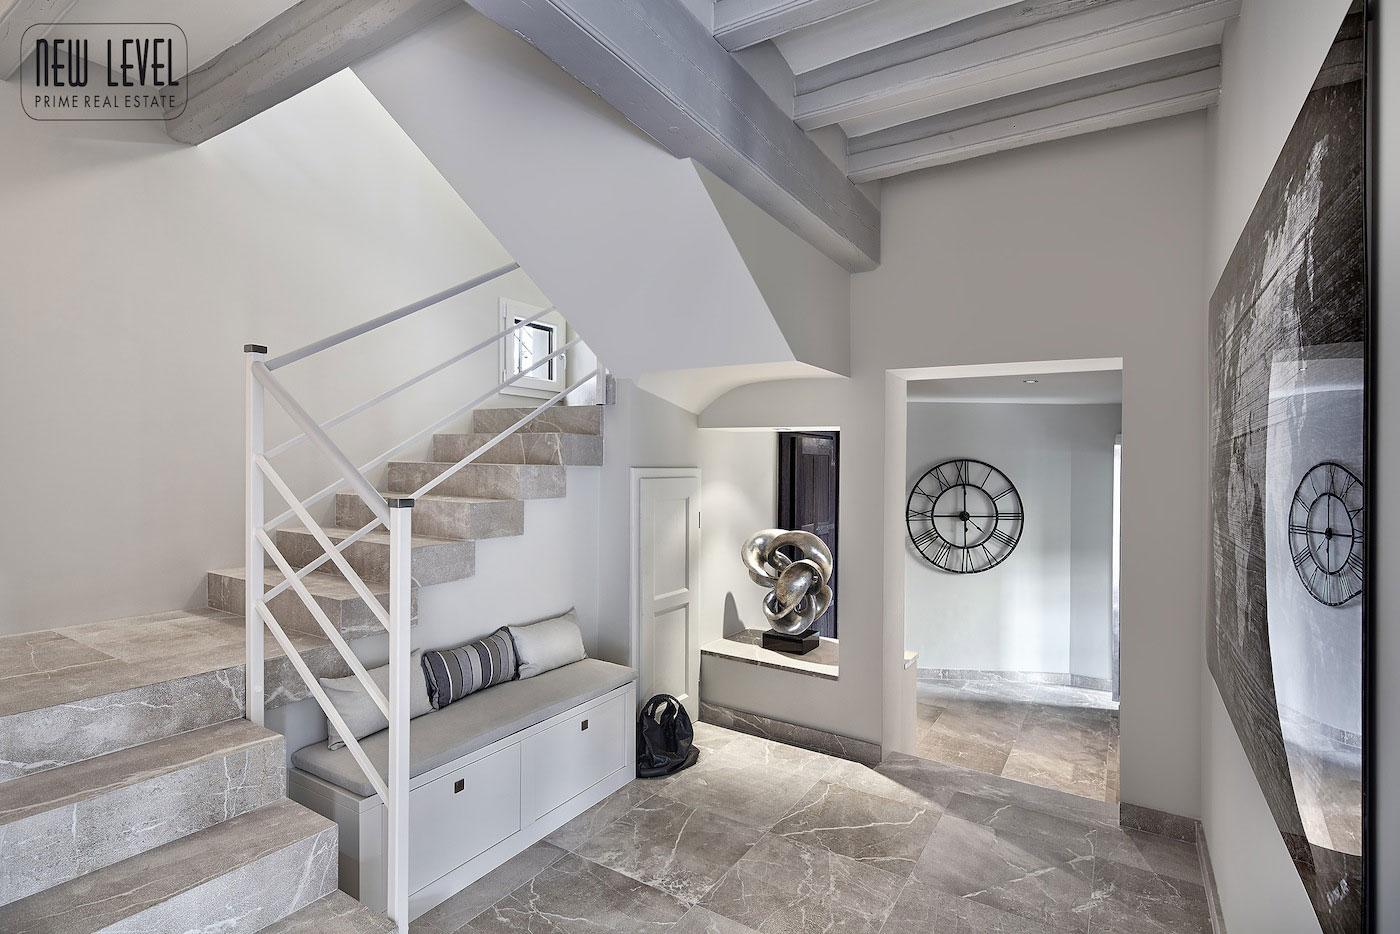 Marble Staircase, Art, Fabulous Villa in Puerto de Andratx, Mallorca